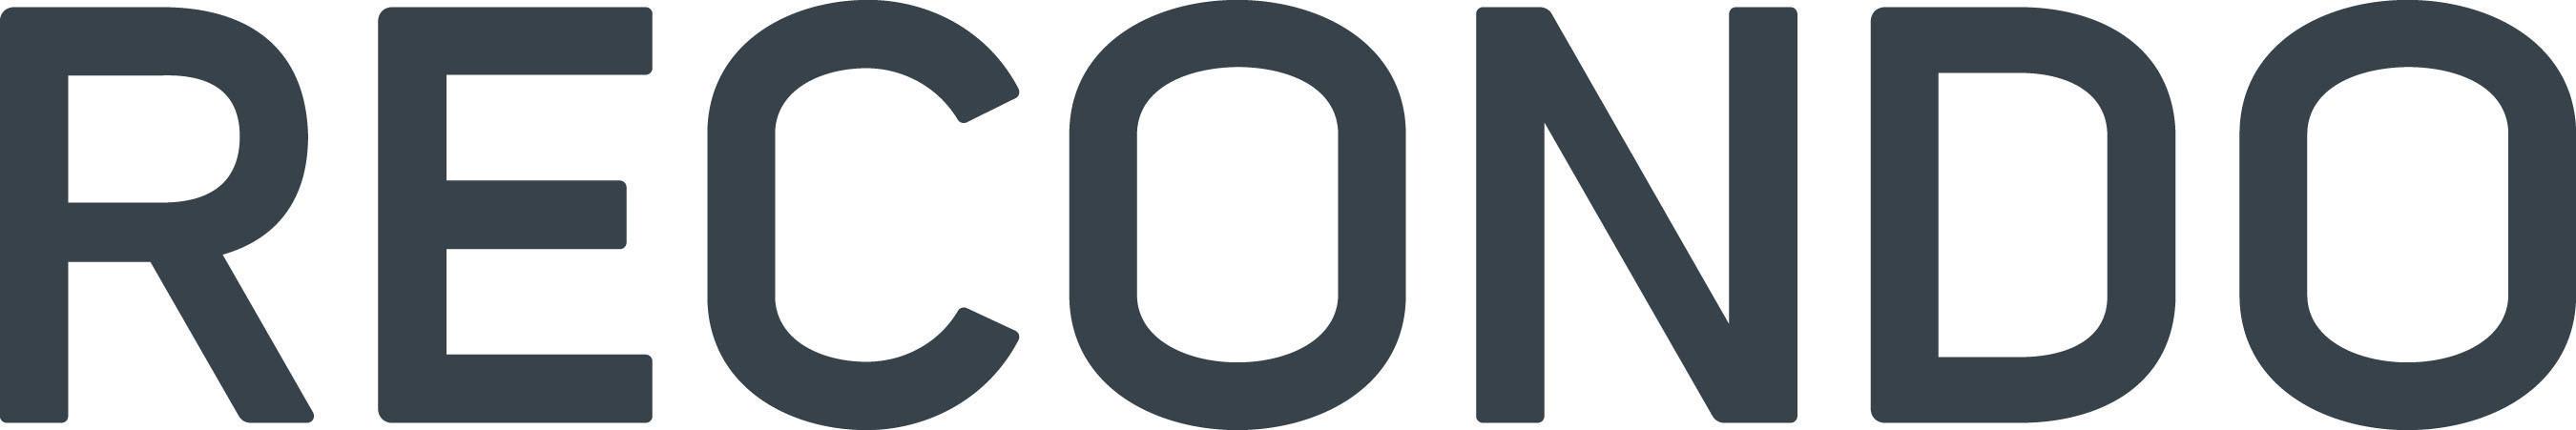 Recondo Logo